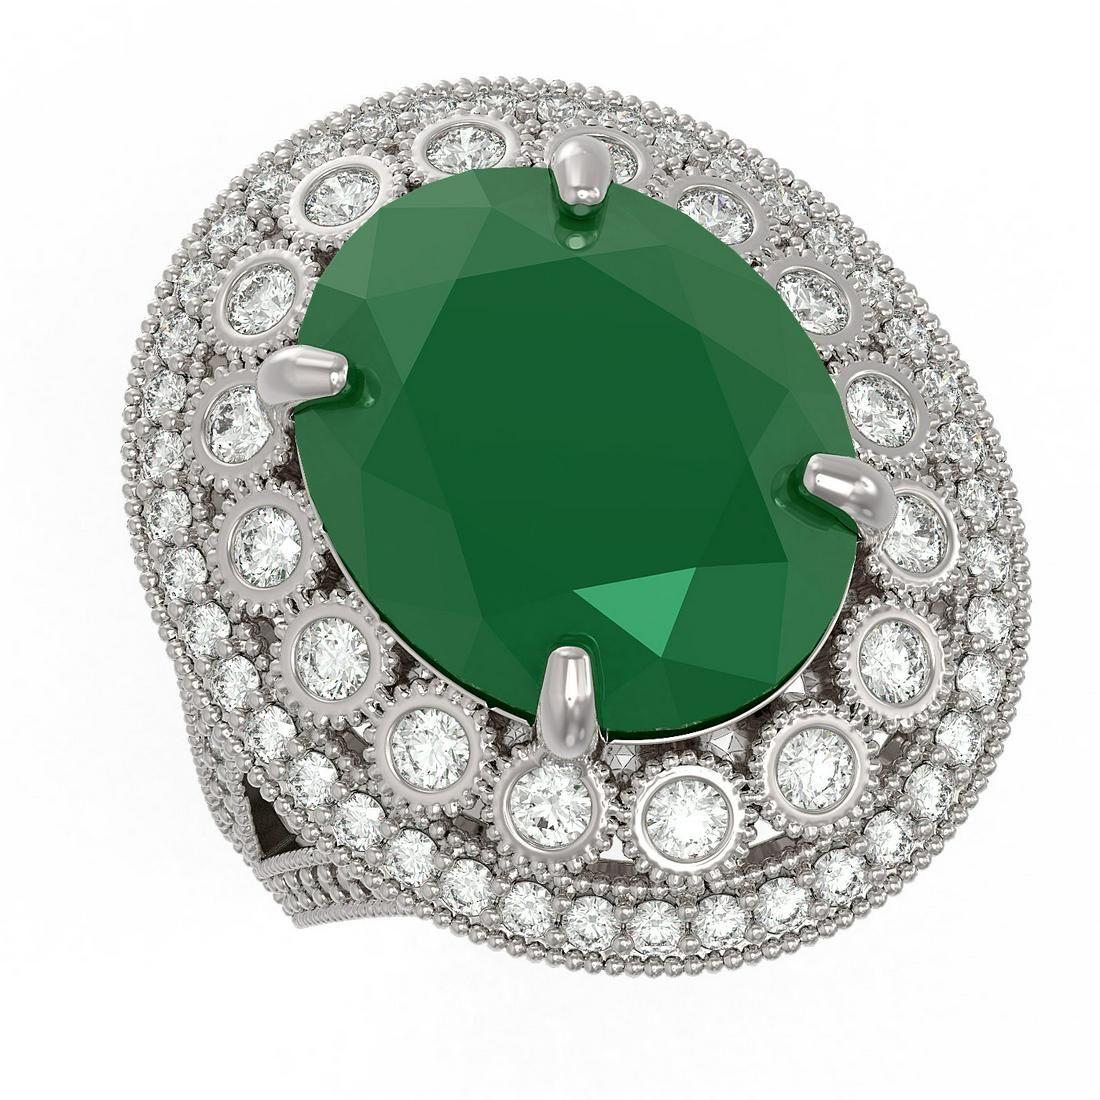 13.85 ctw Certified Emerald & Diamond Victorian Ring